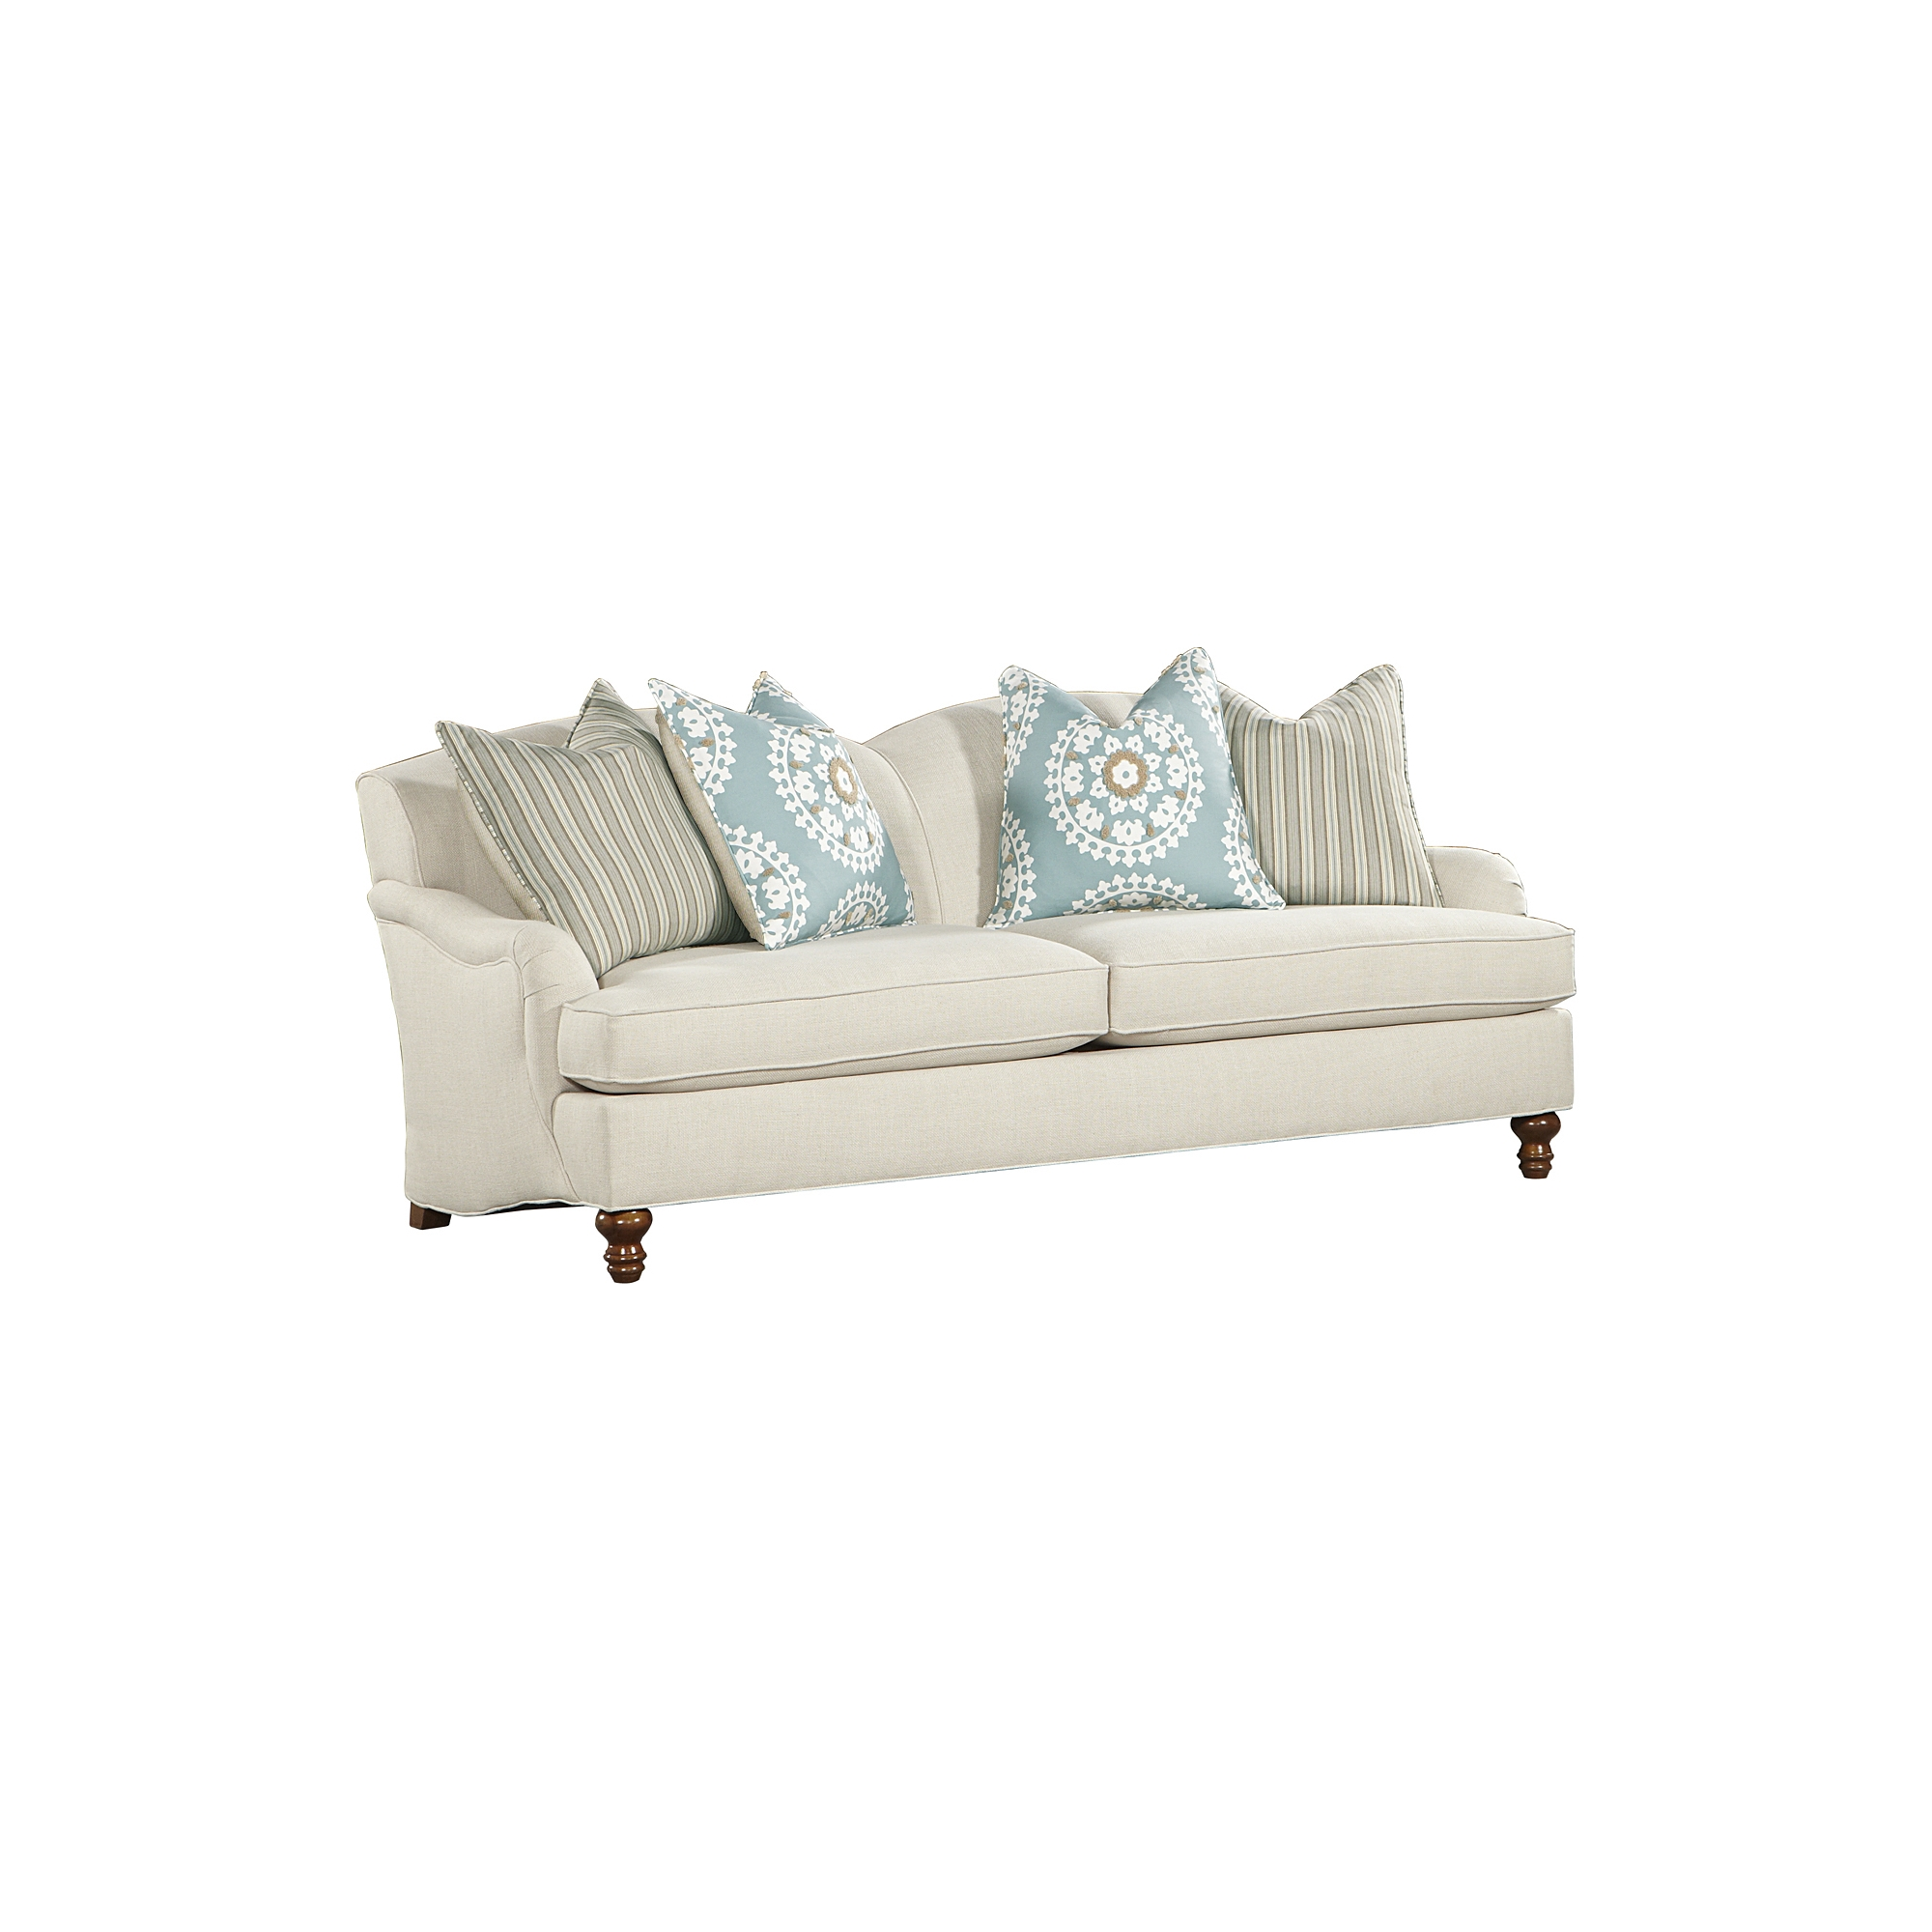 Havertys siesta sofa living room amazing thomasville for Havertys furniture